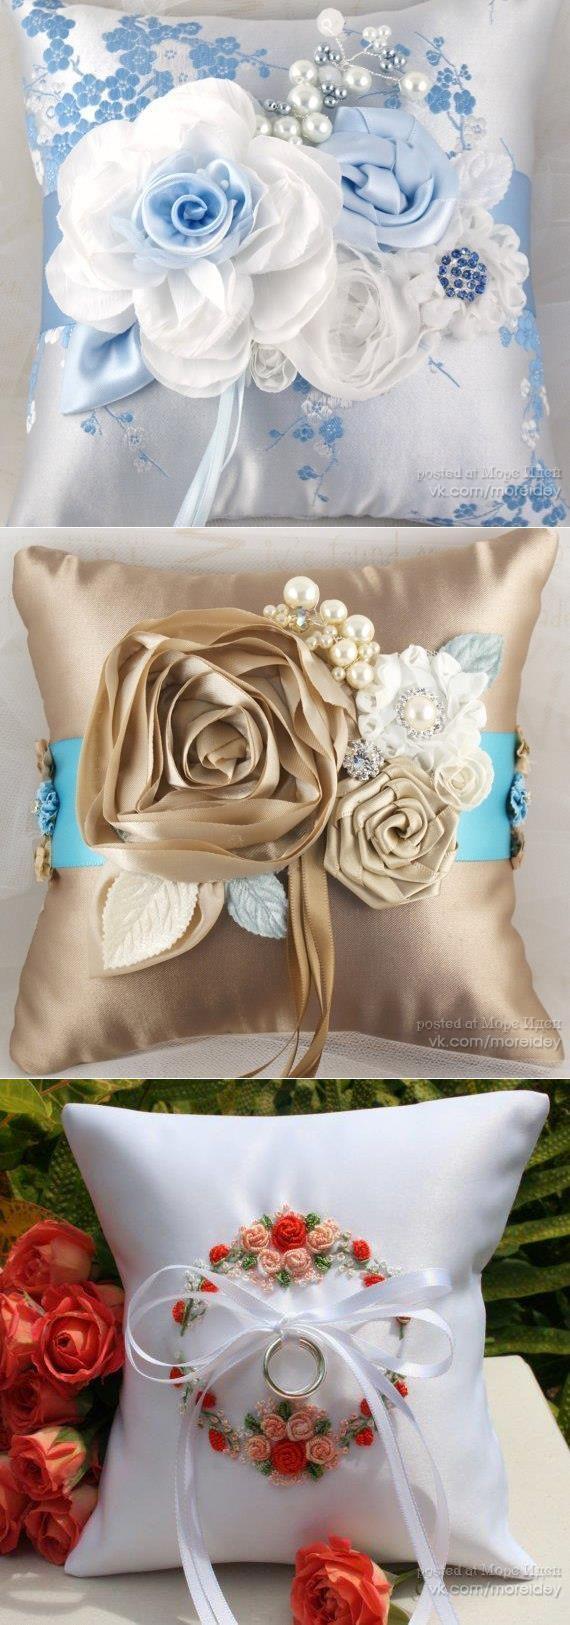 Декоративные подушки.Идеи / Рукоделие